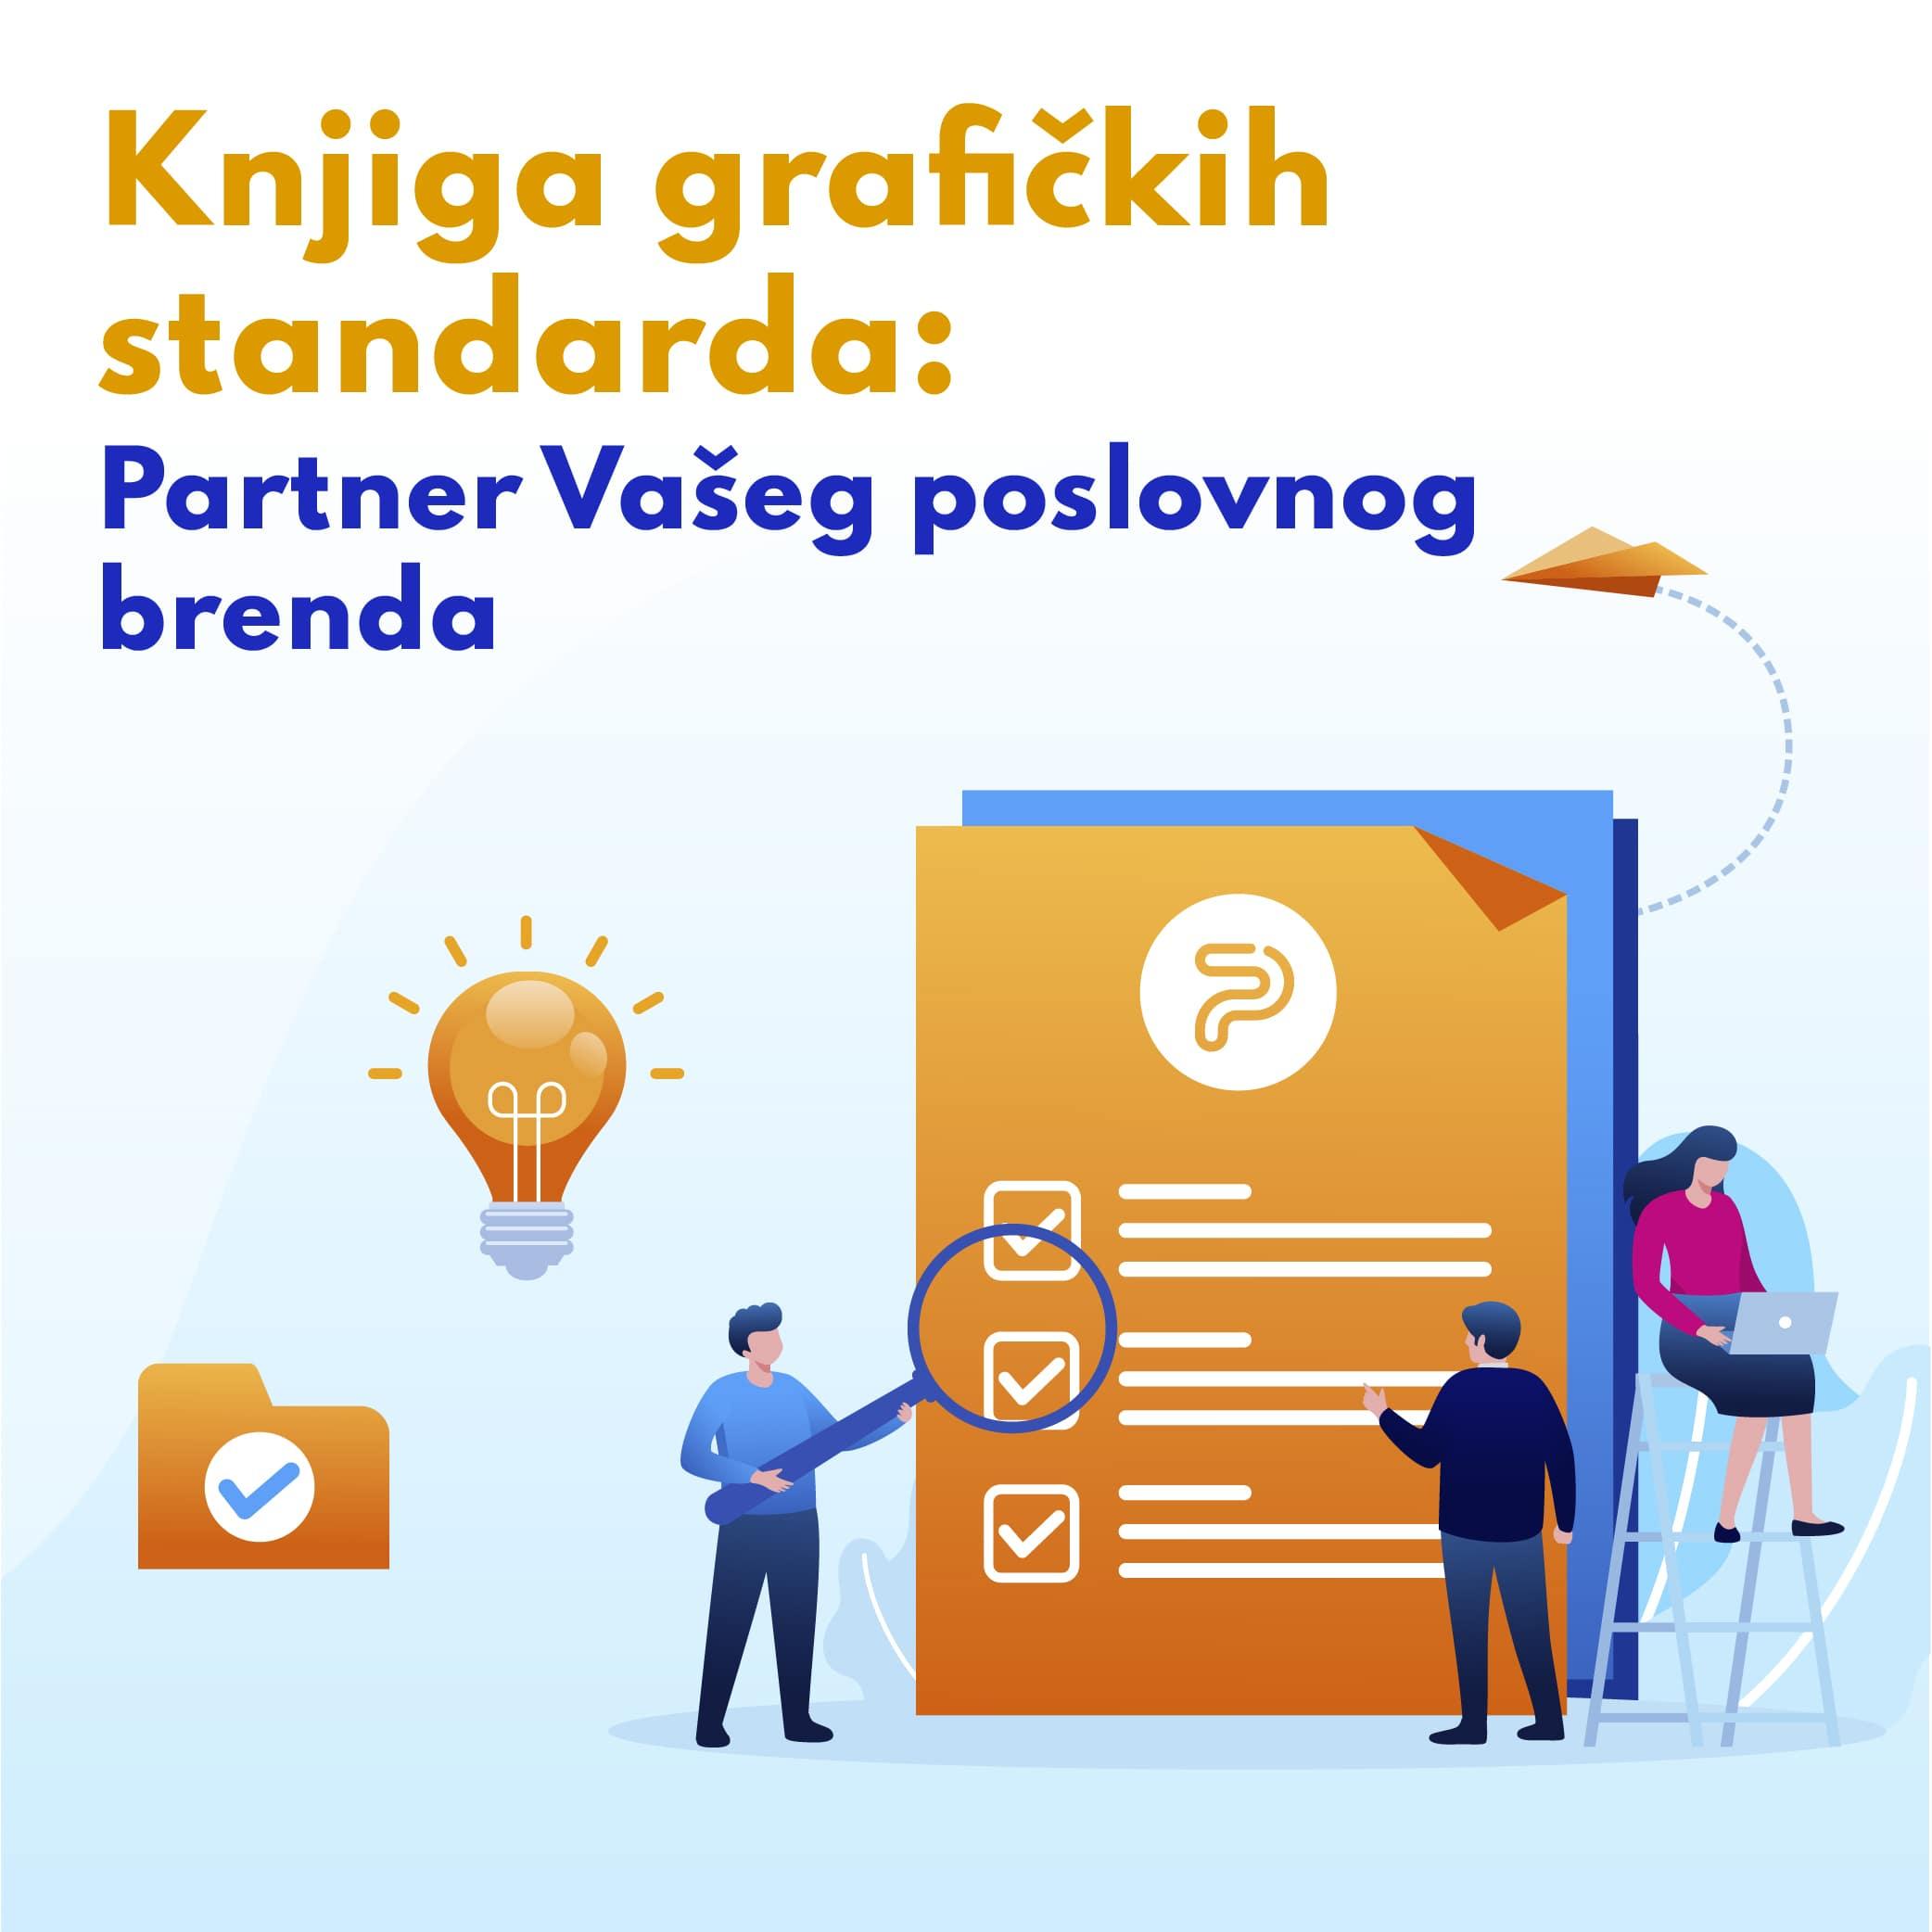 52485Knjiga grafičkih standarda: Partner Vašeg poslovnog brenda